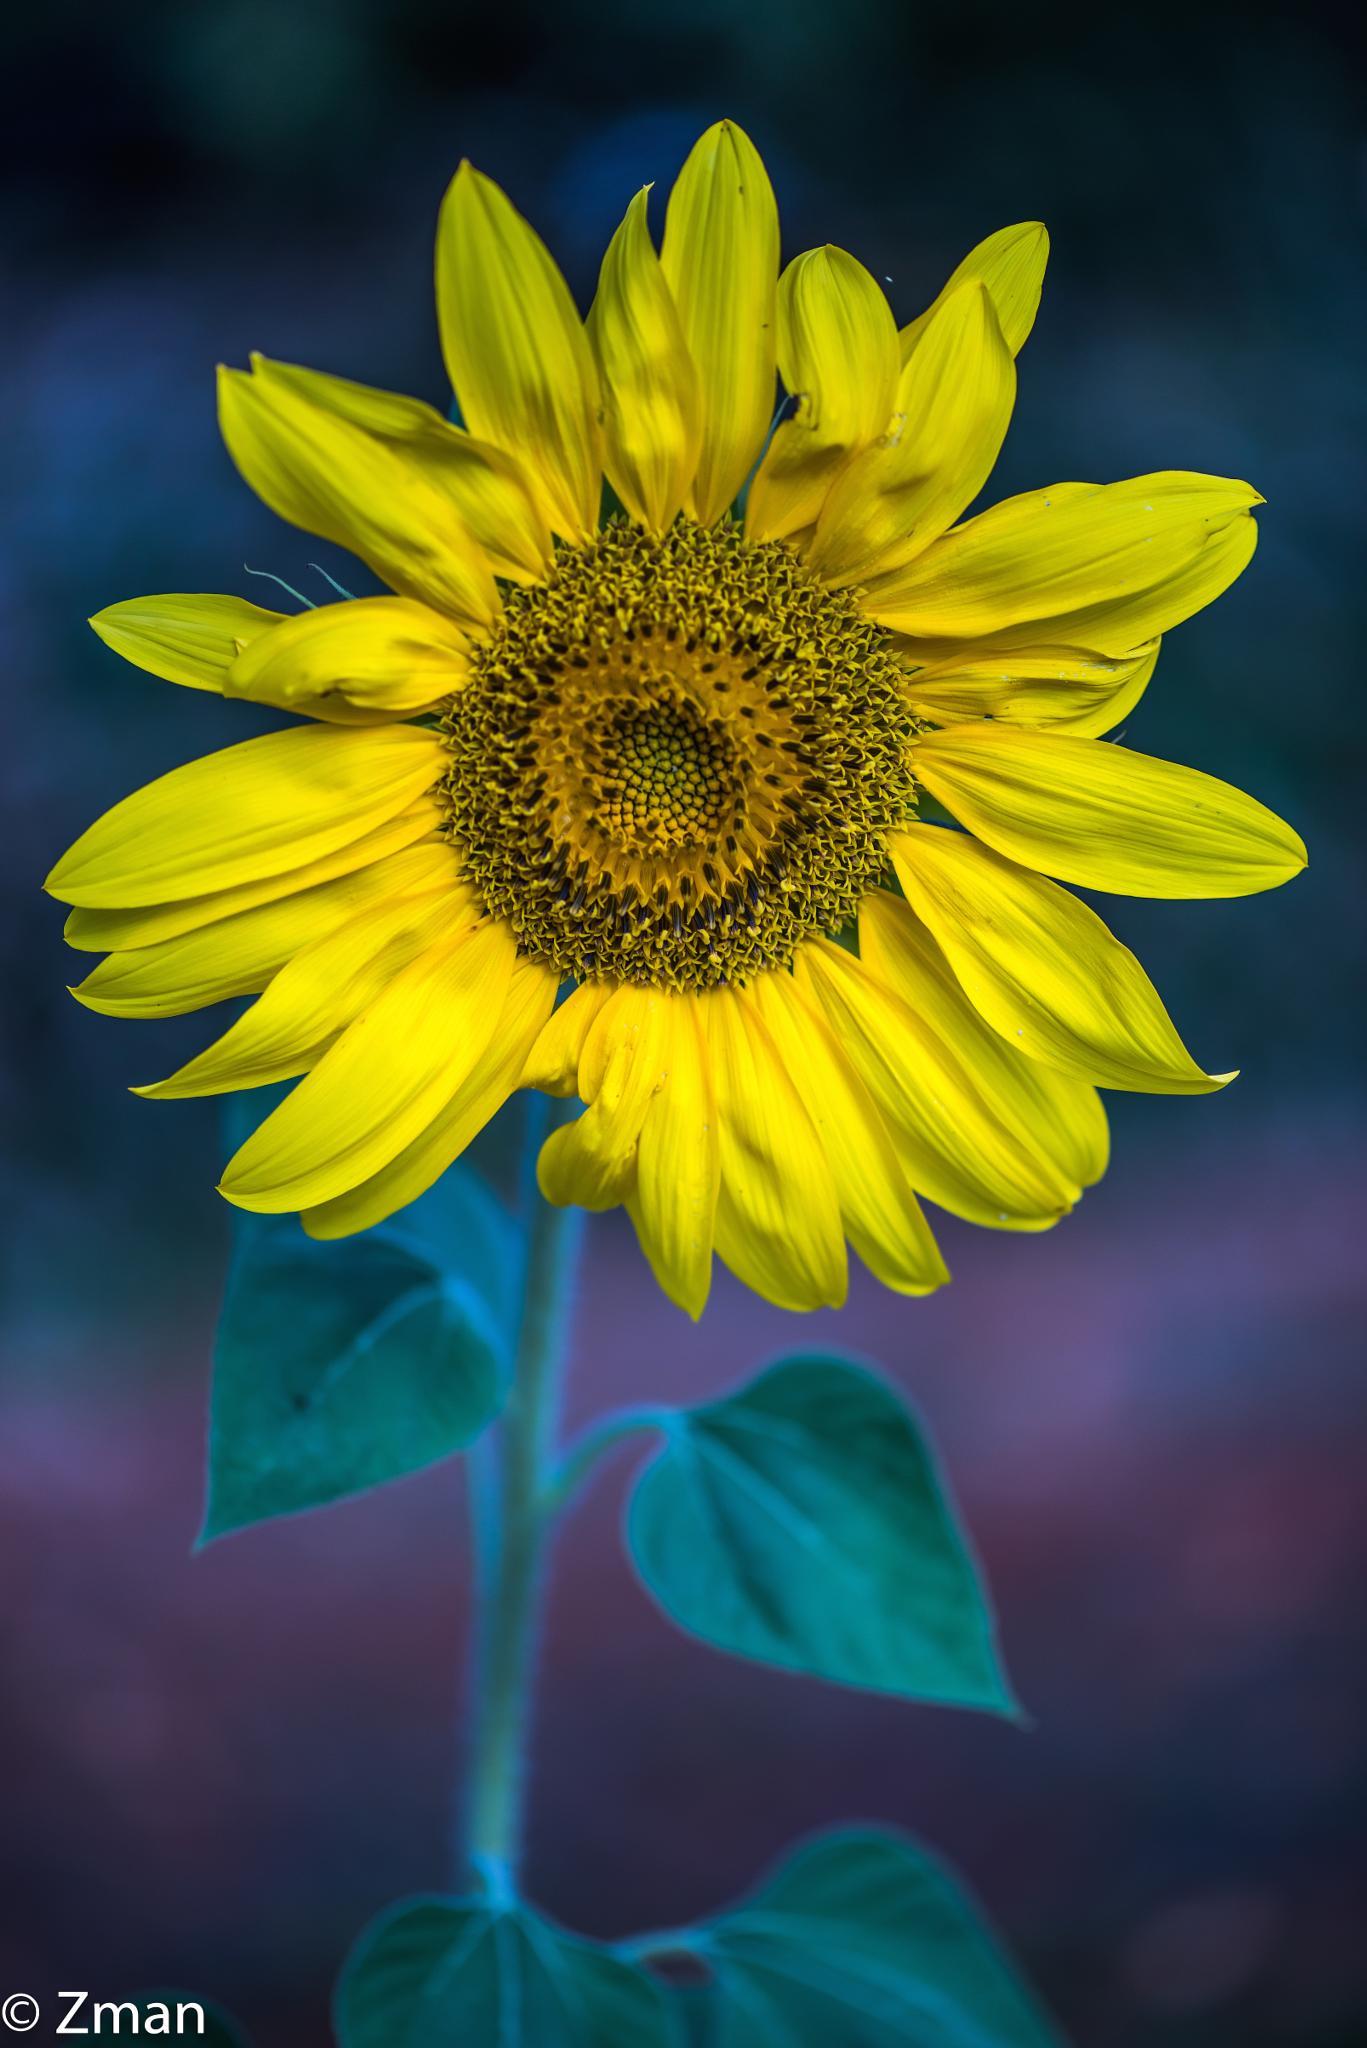 Lonely Sunflower by muhammad.nasser.963